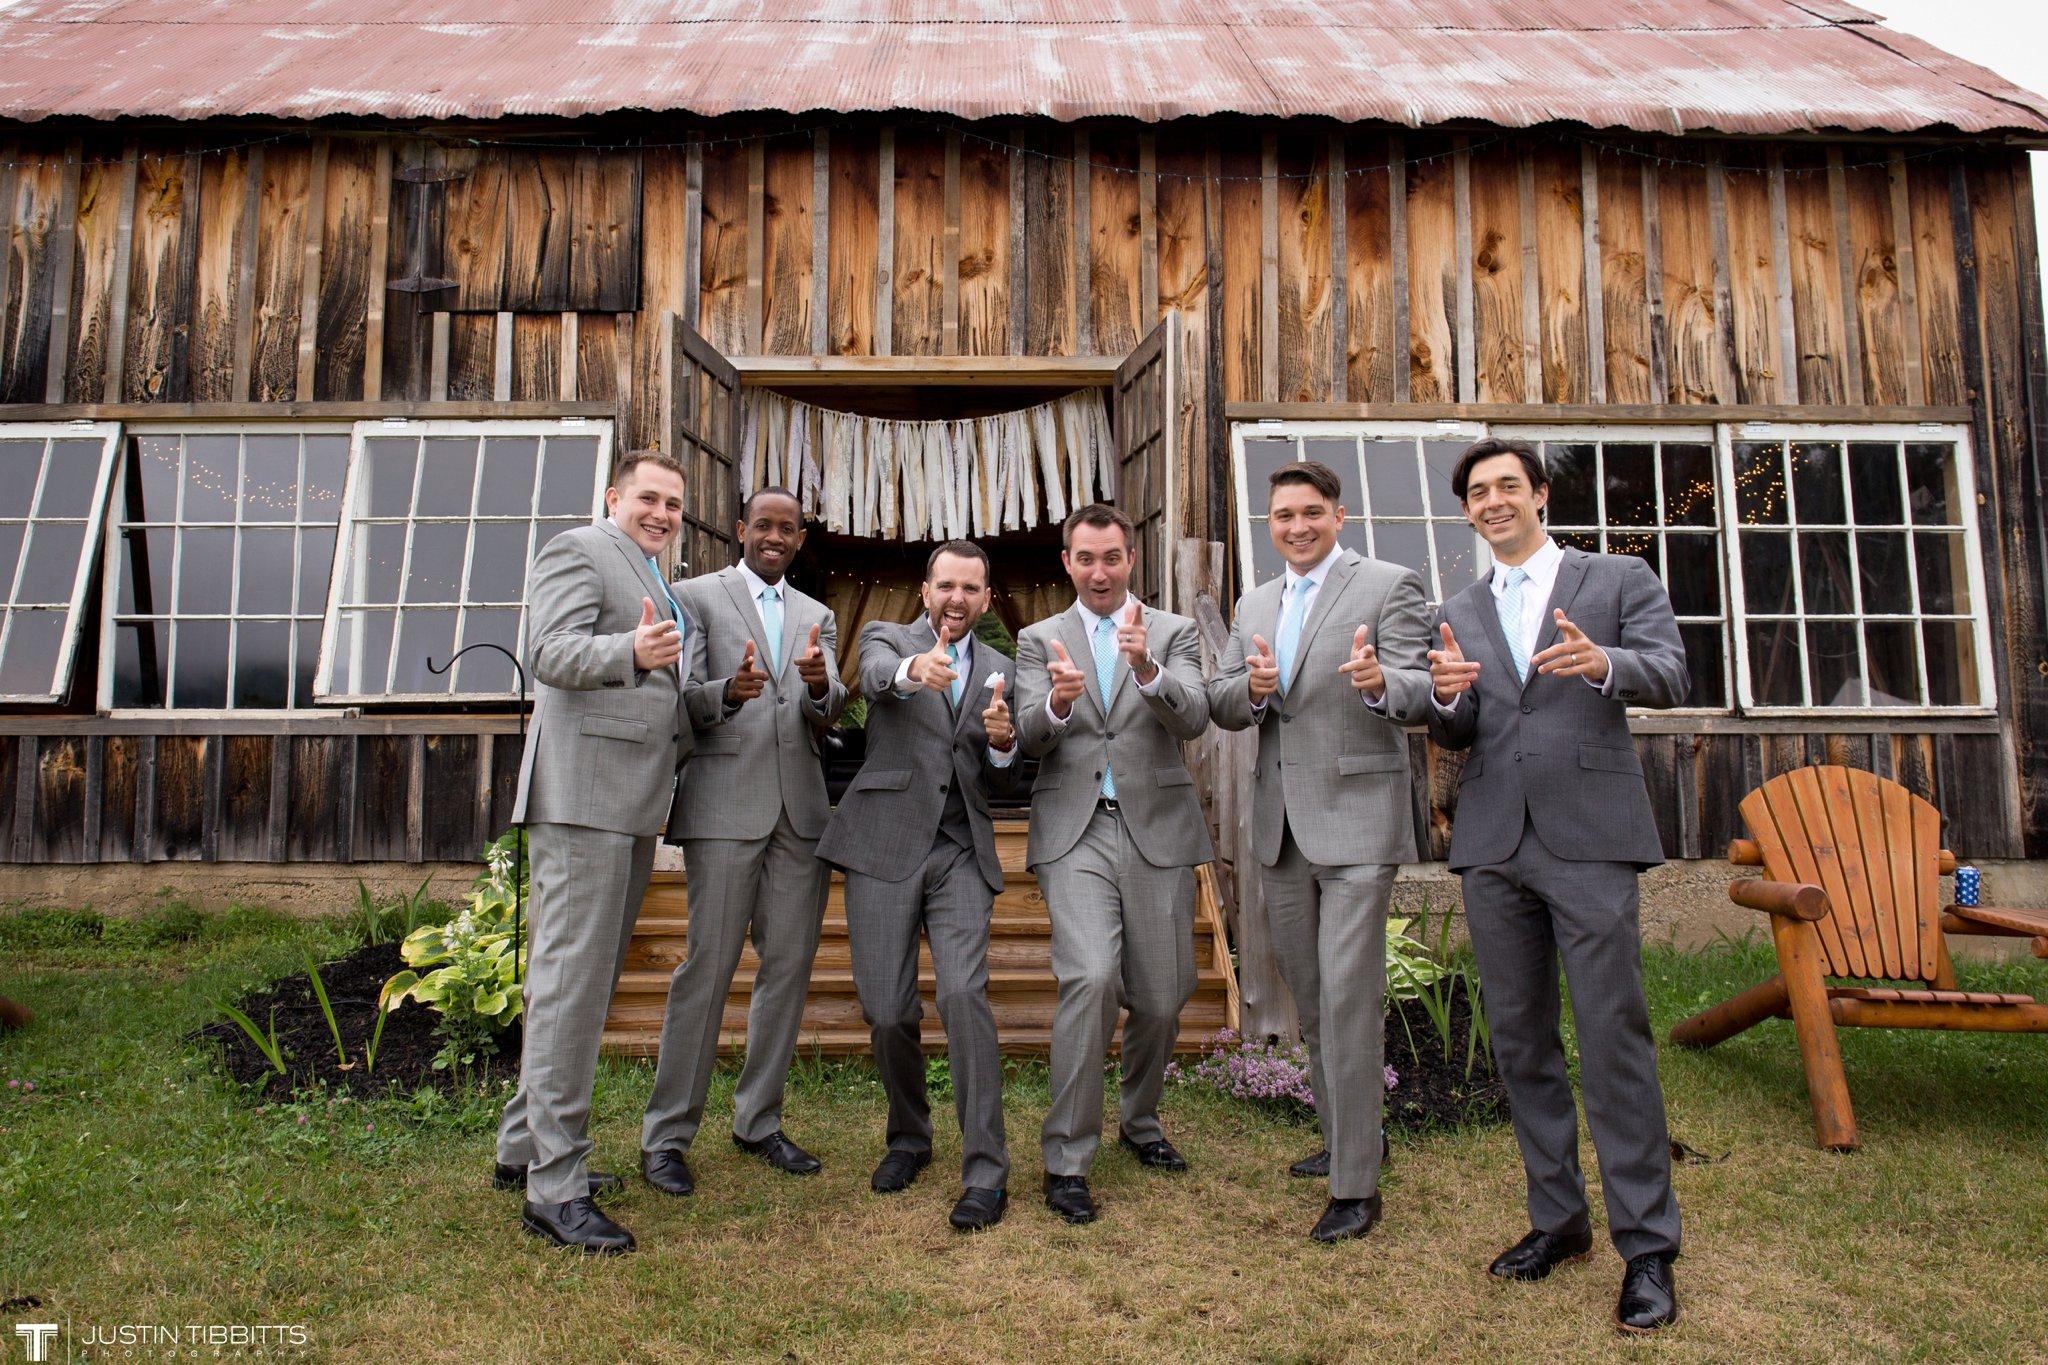 burlap-and-beams-wedding-photos-with-joran-and-molly_0039